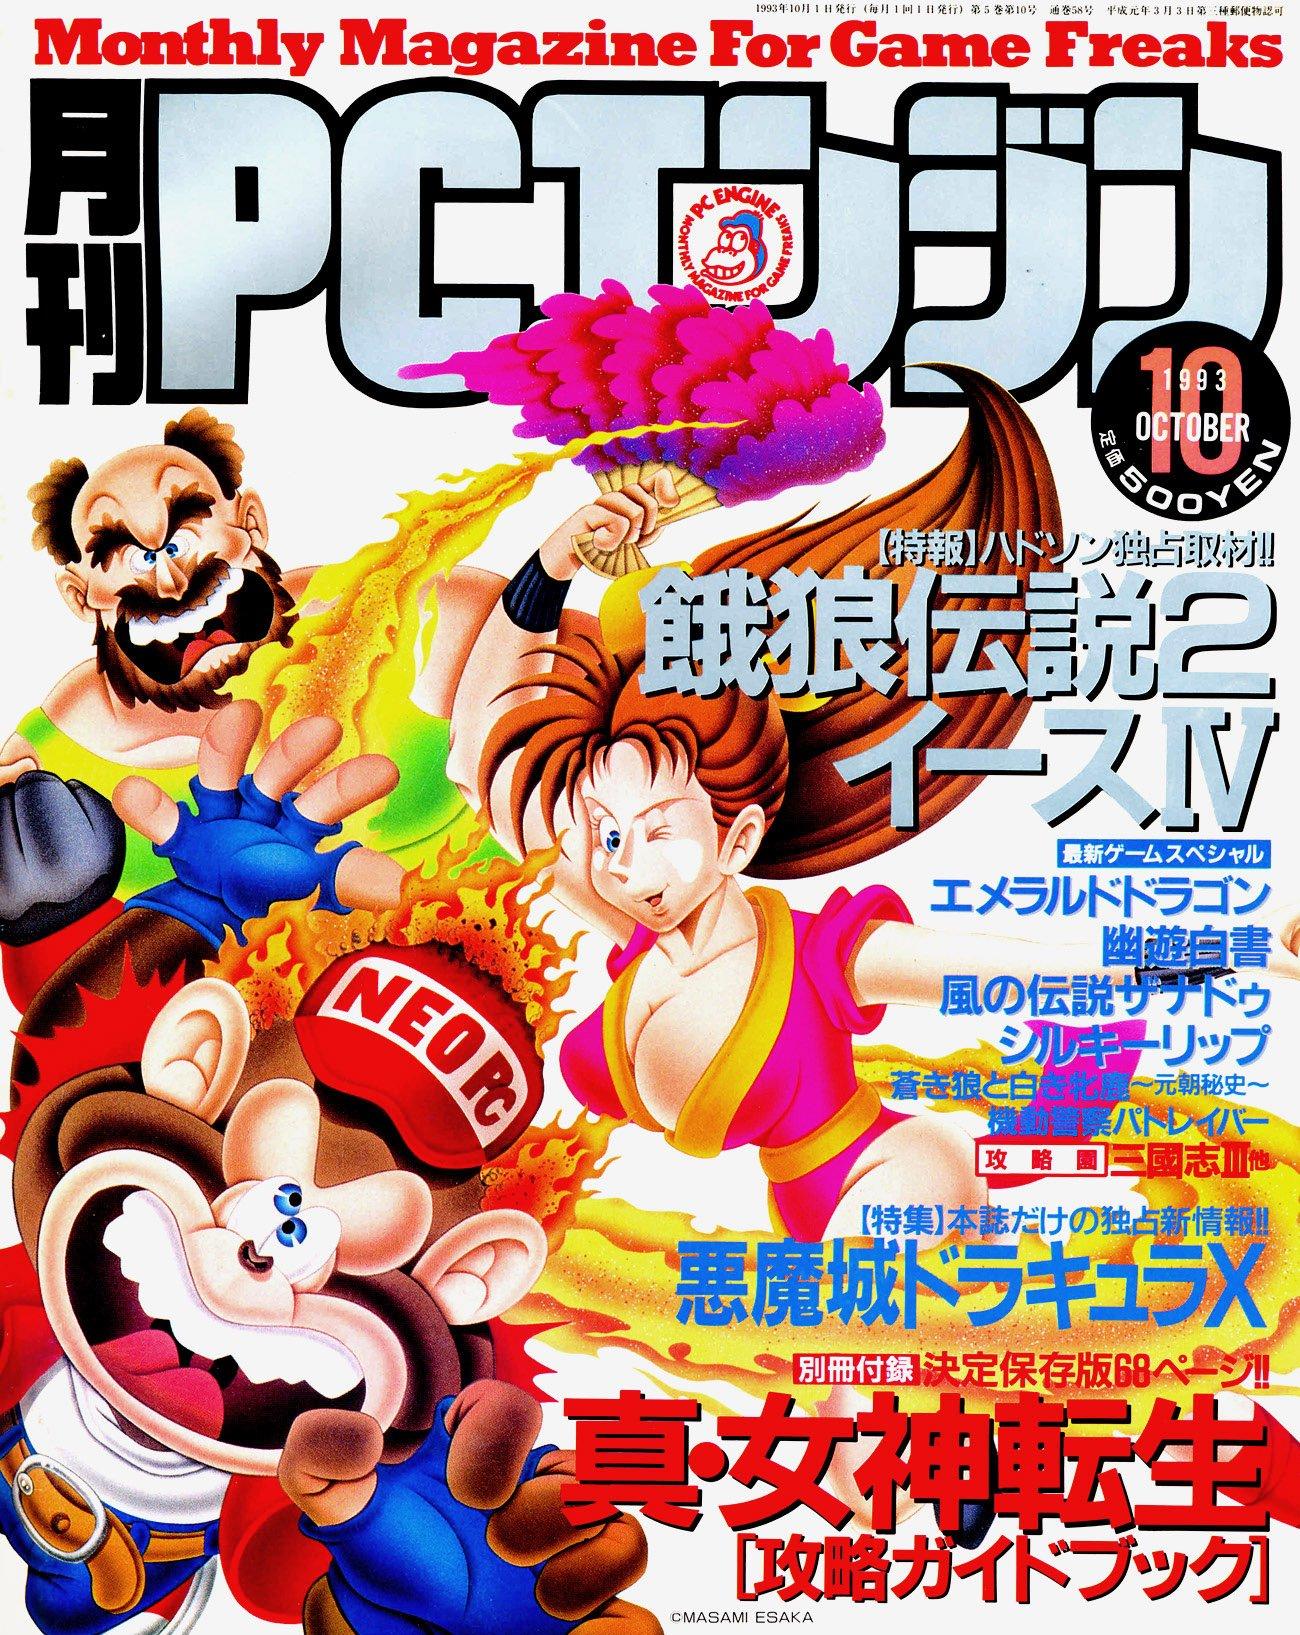 Gekkan PC Engine Issue 58 (October 1993)